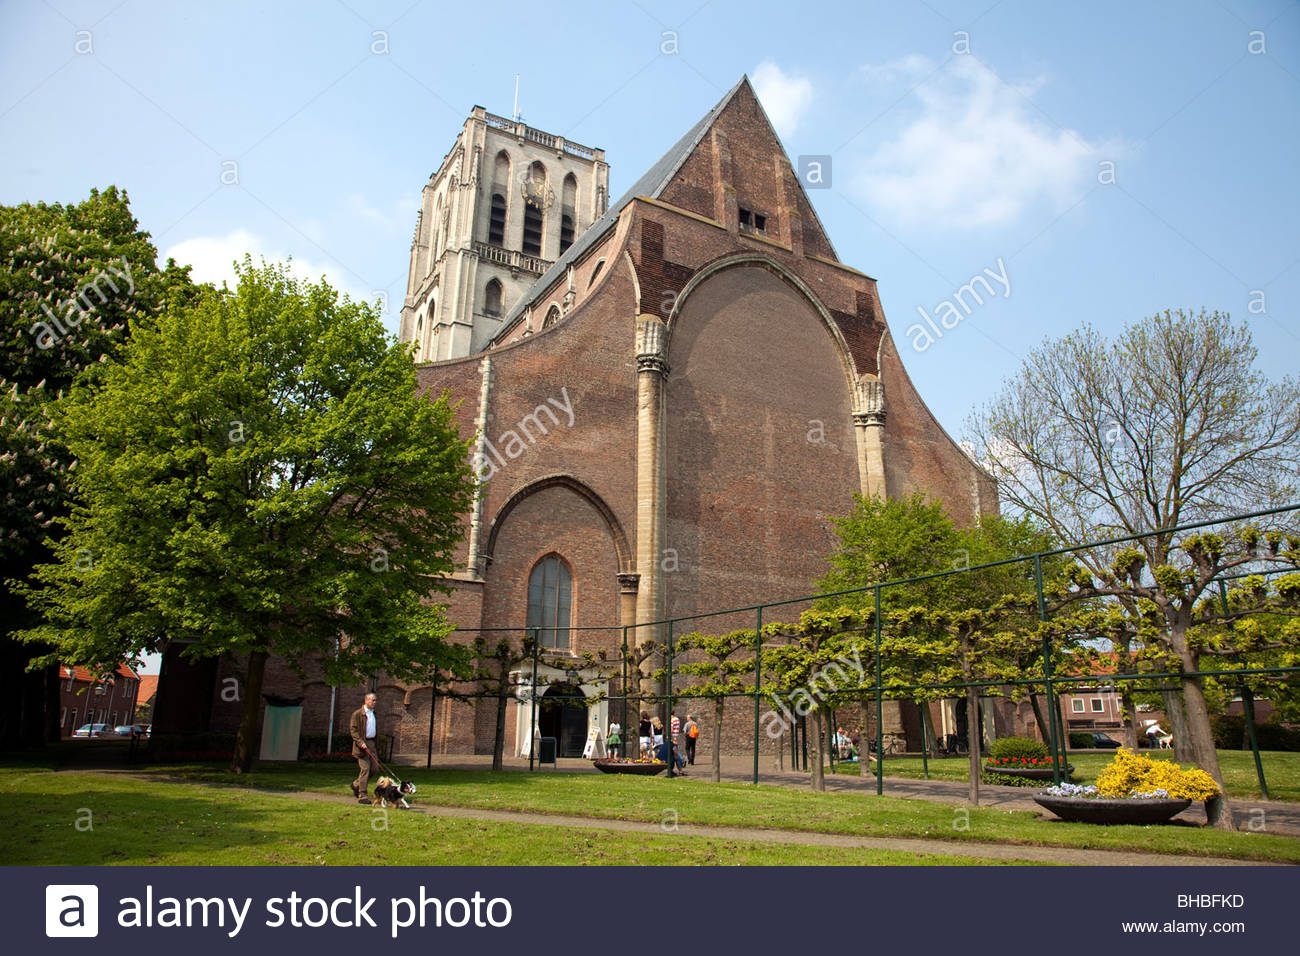 Benelux bomen boom Brielle church dutch Europe Holland kerk kerktoren Netherlands Sint Catharijnekerk St stad tower - Stock Image